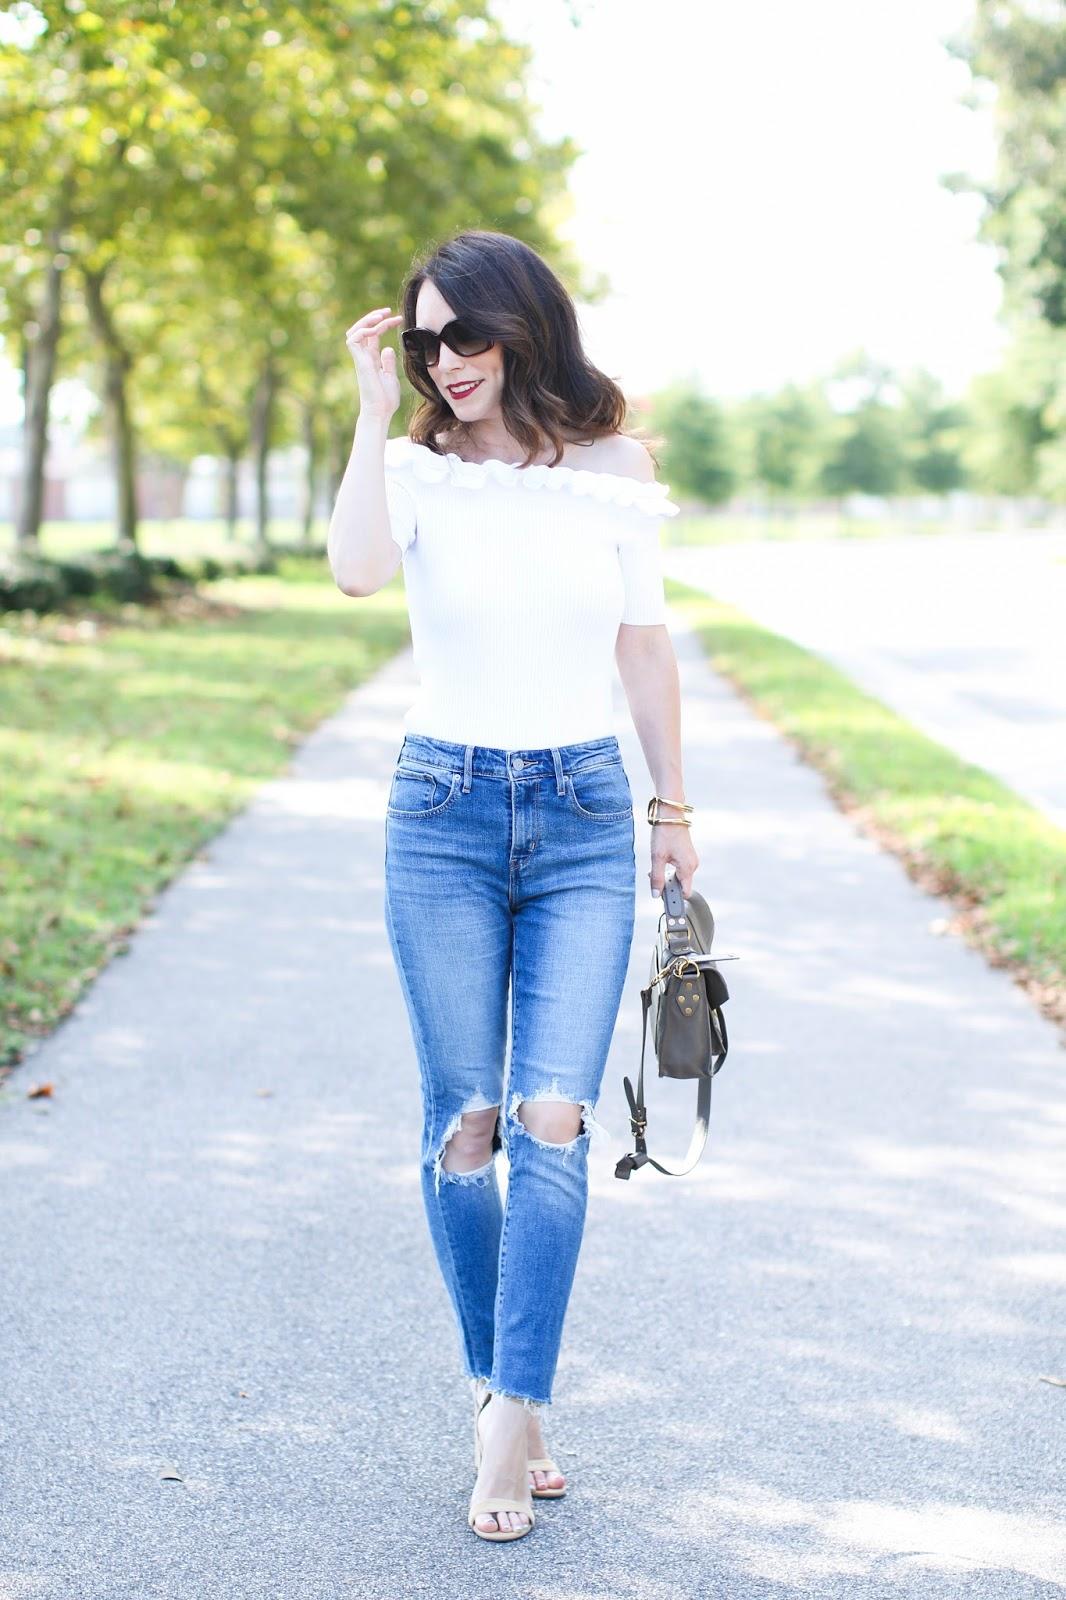 levi's rugged indigo jeans